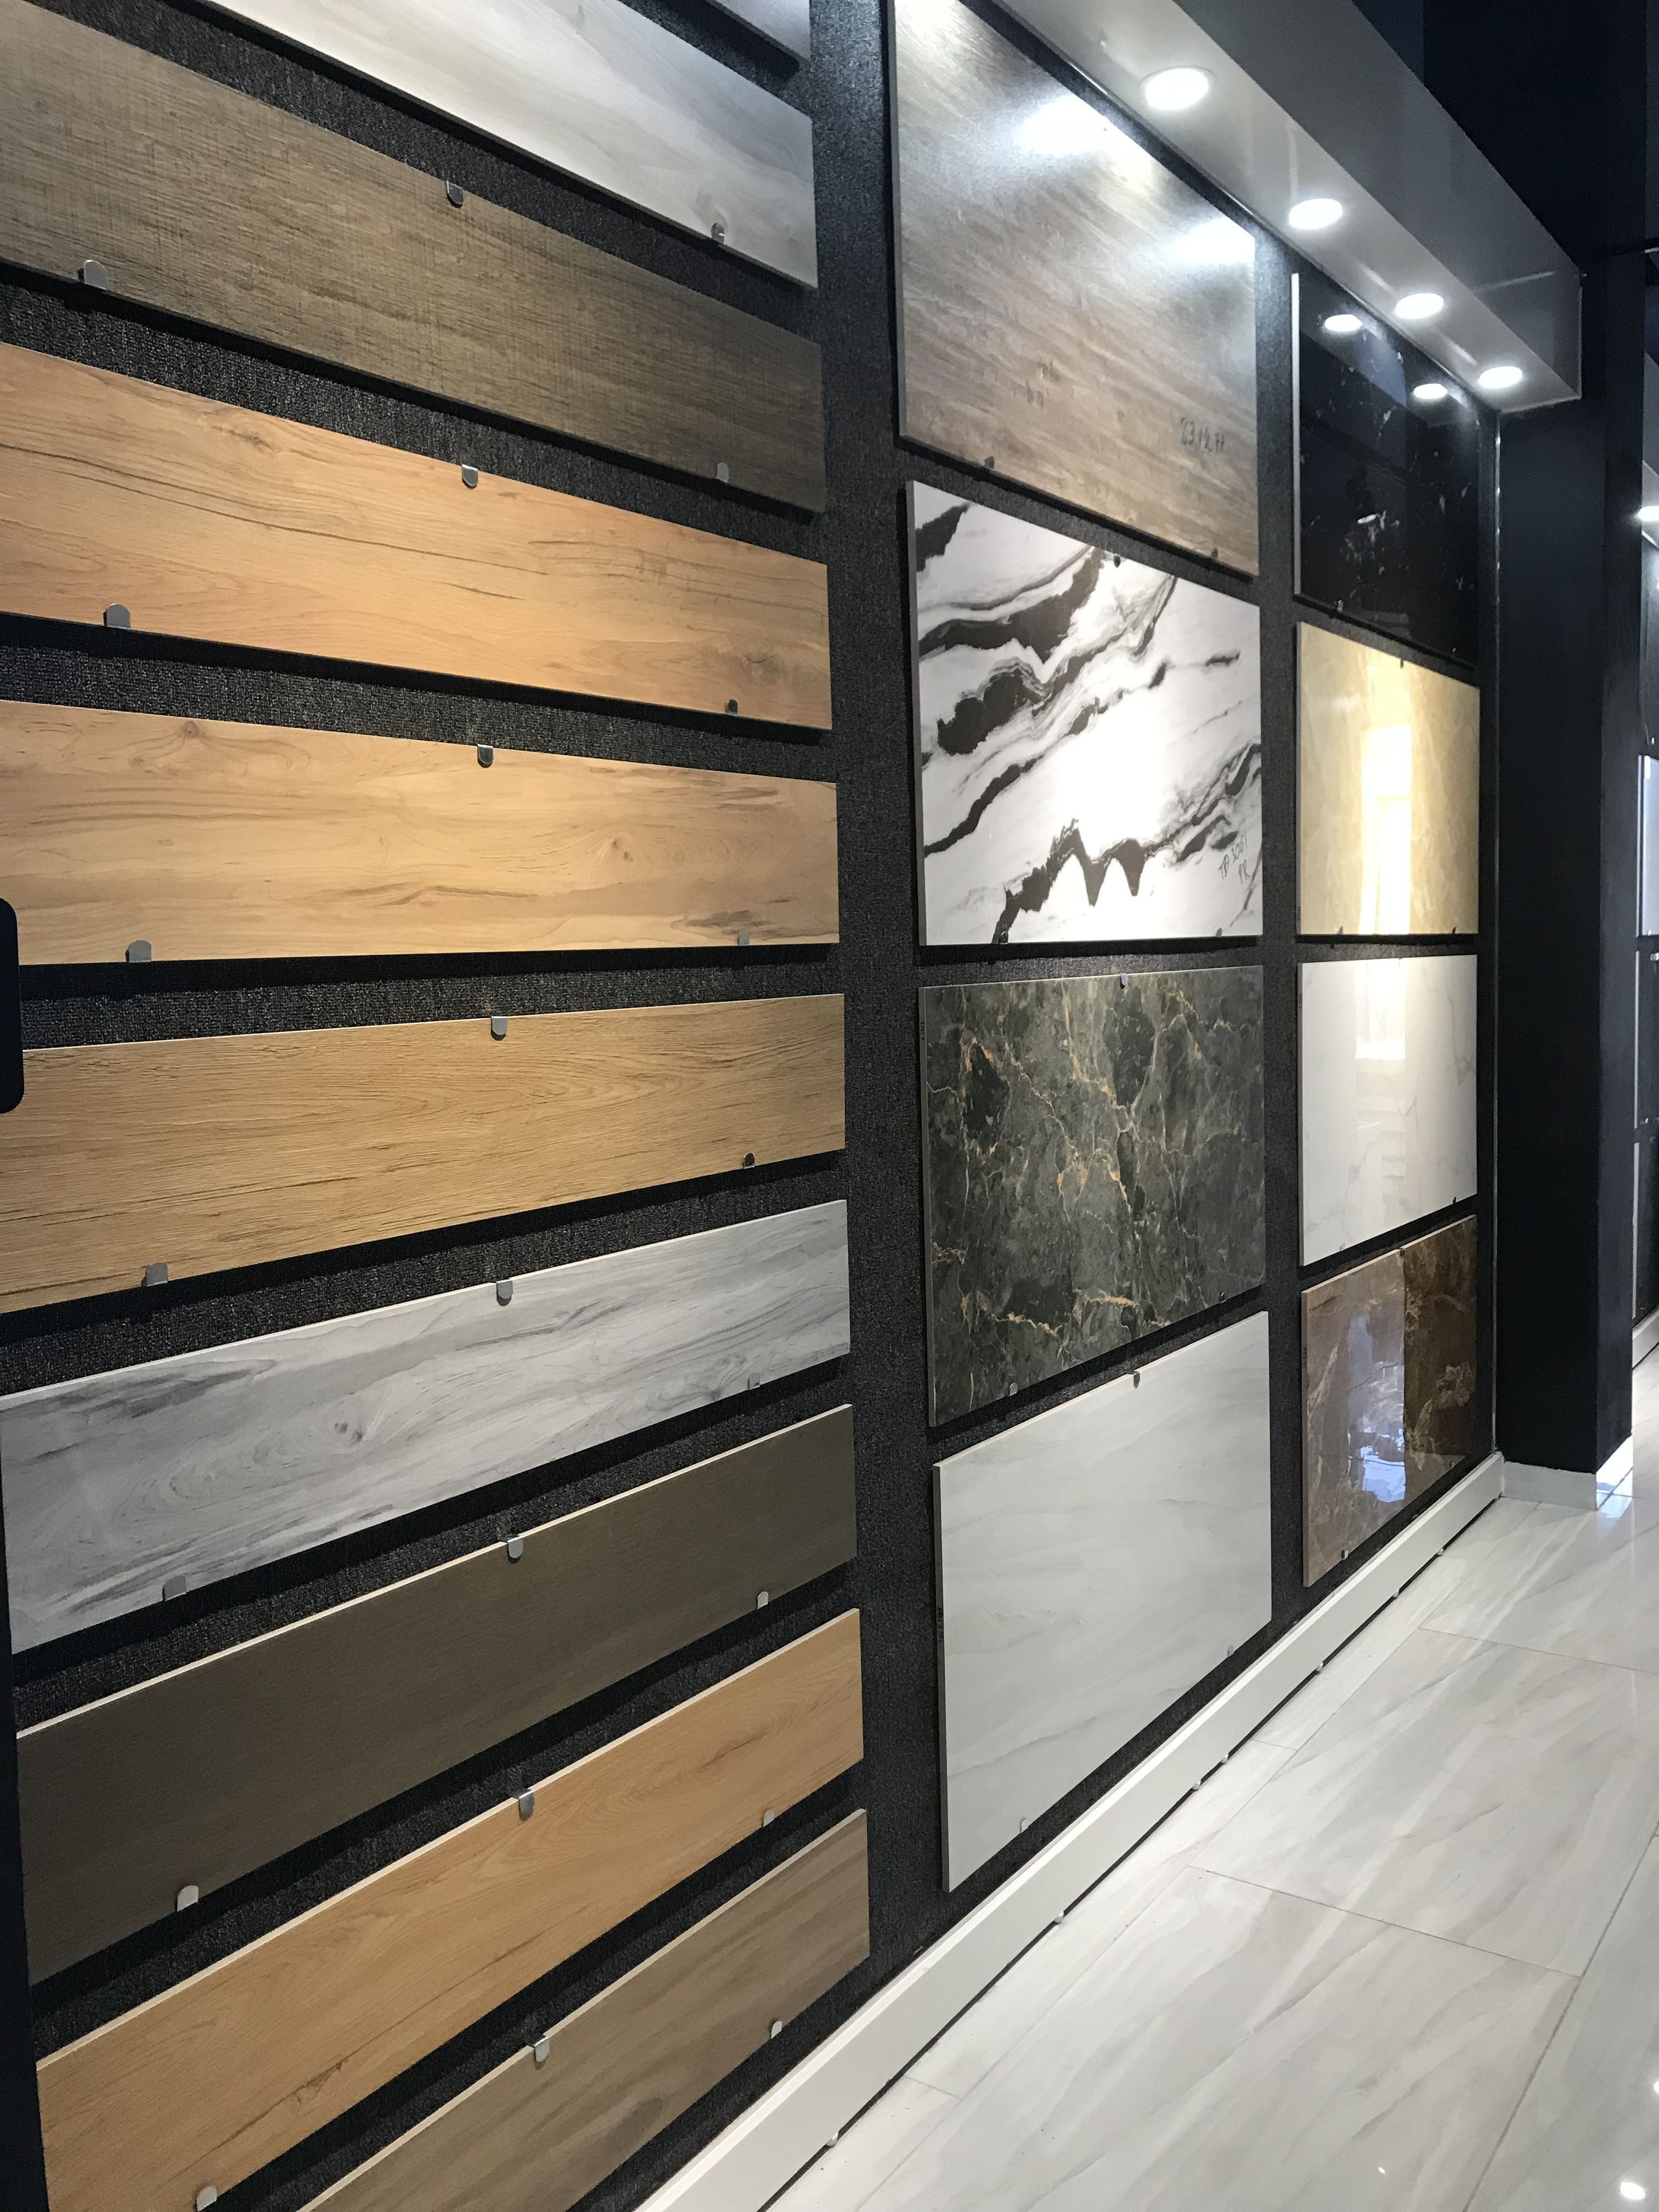 Our Office Luxurybathroomshowroom Bathroom Showrooms Showroom